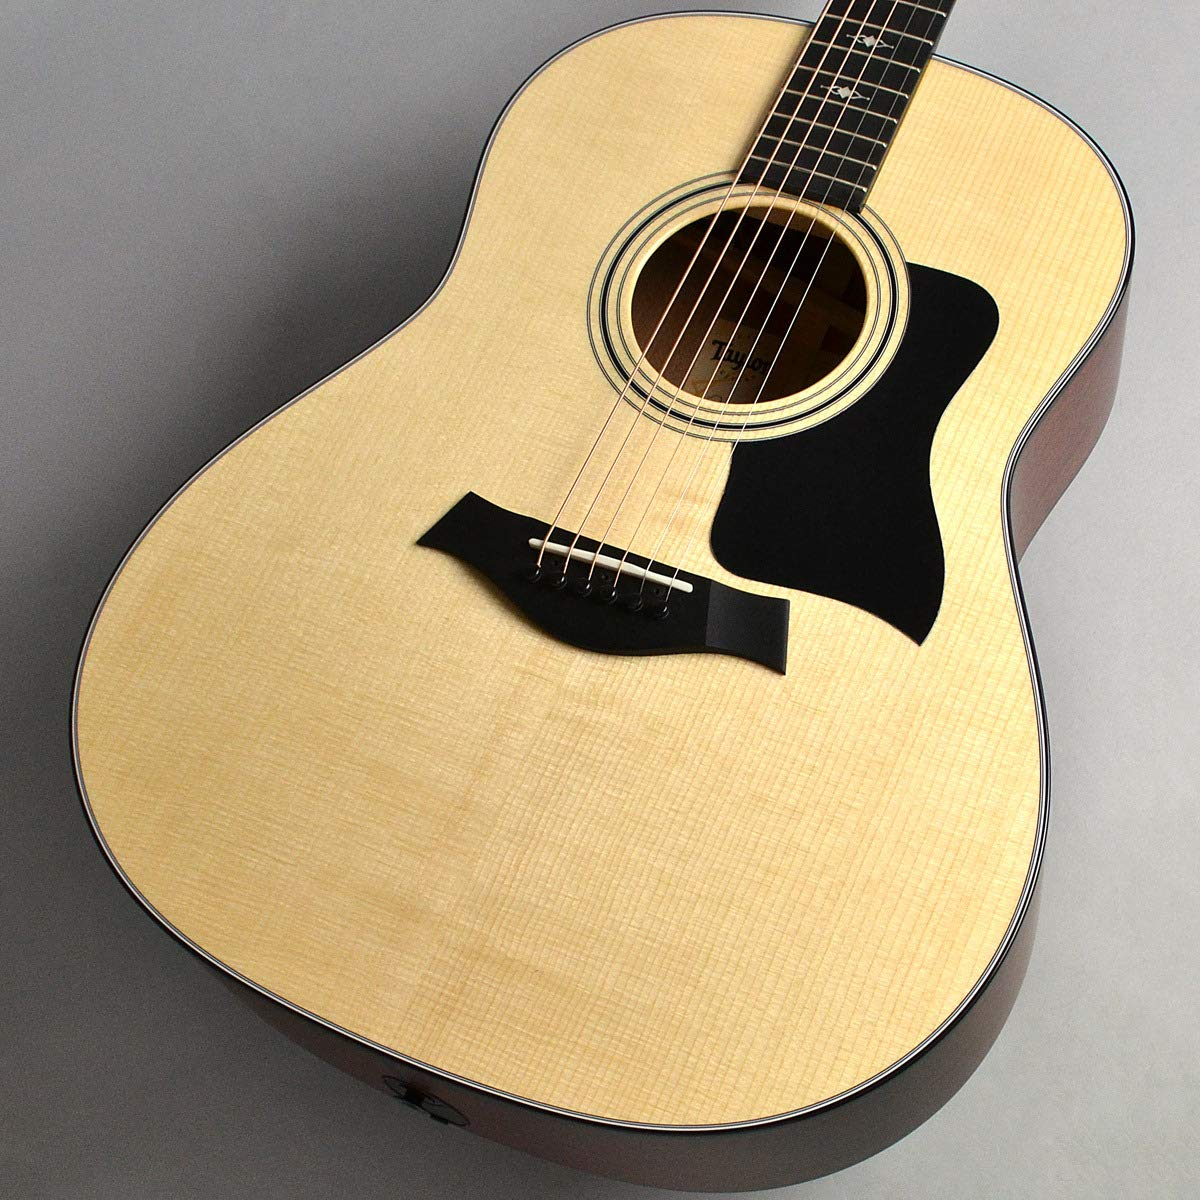 Taylor 317e V-Class/Natural エレアコギター テイラー B07QRGX59R